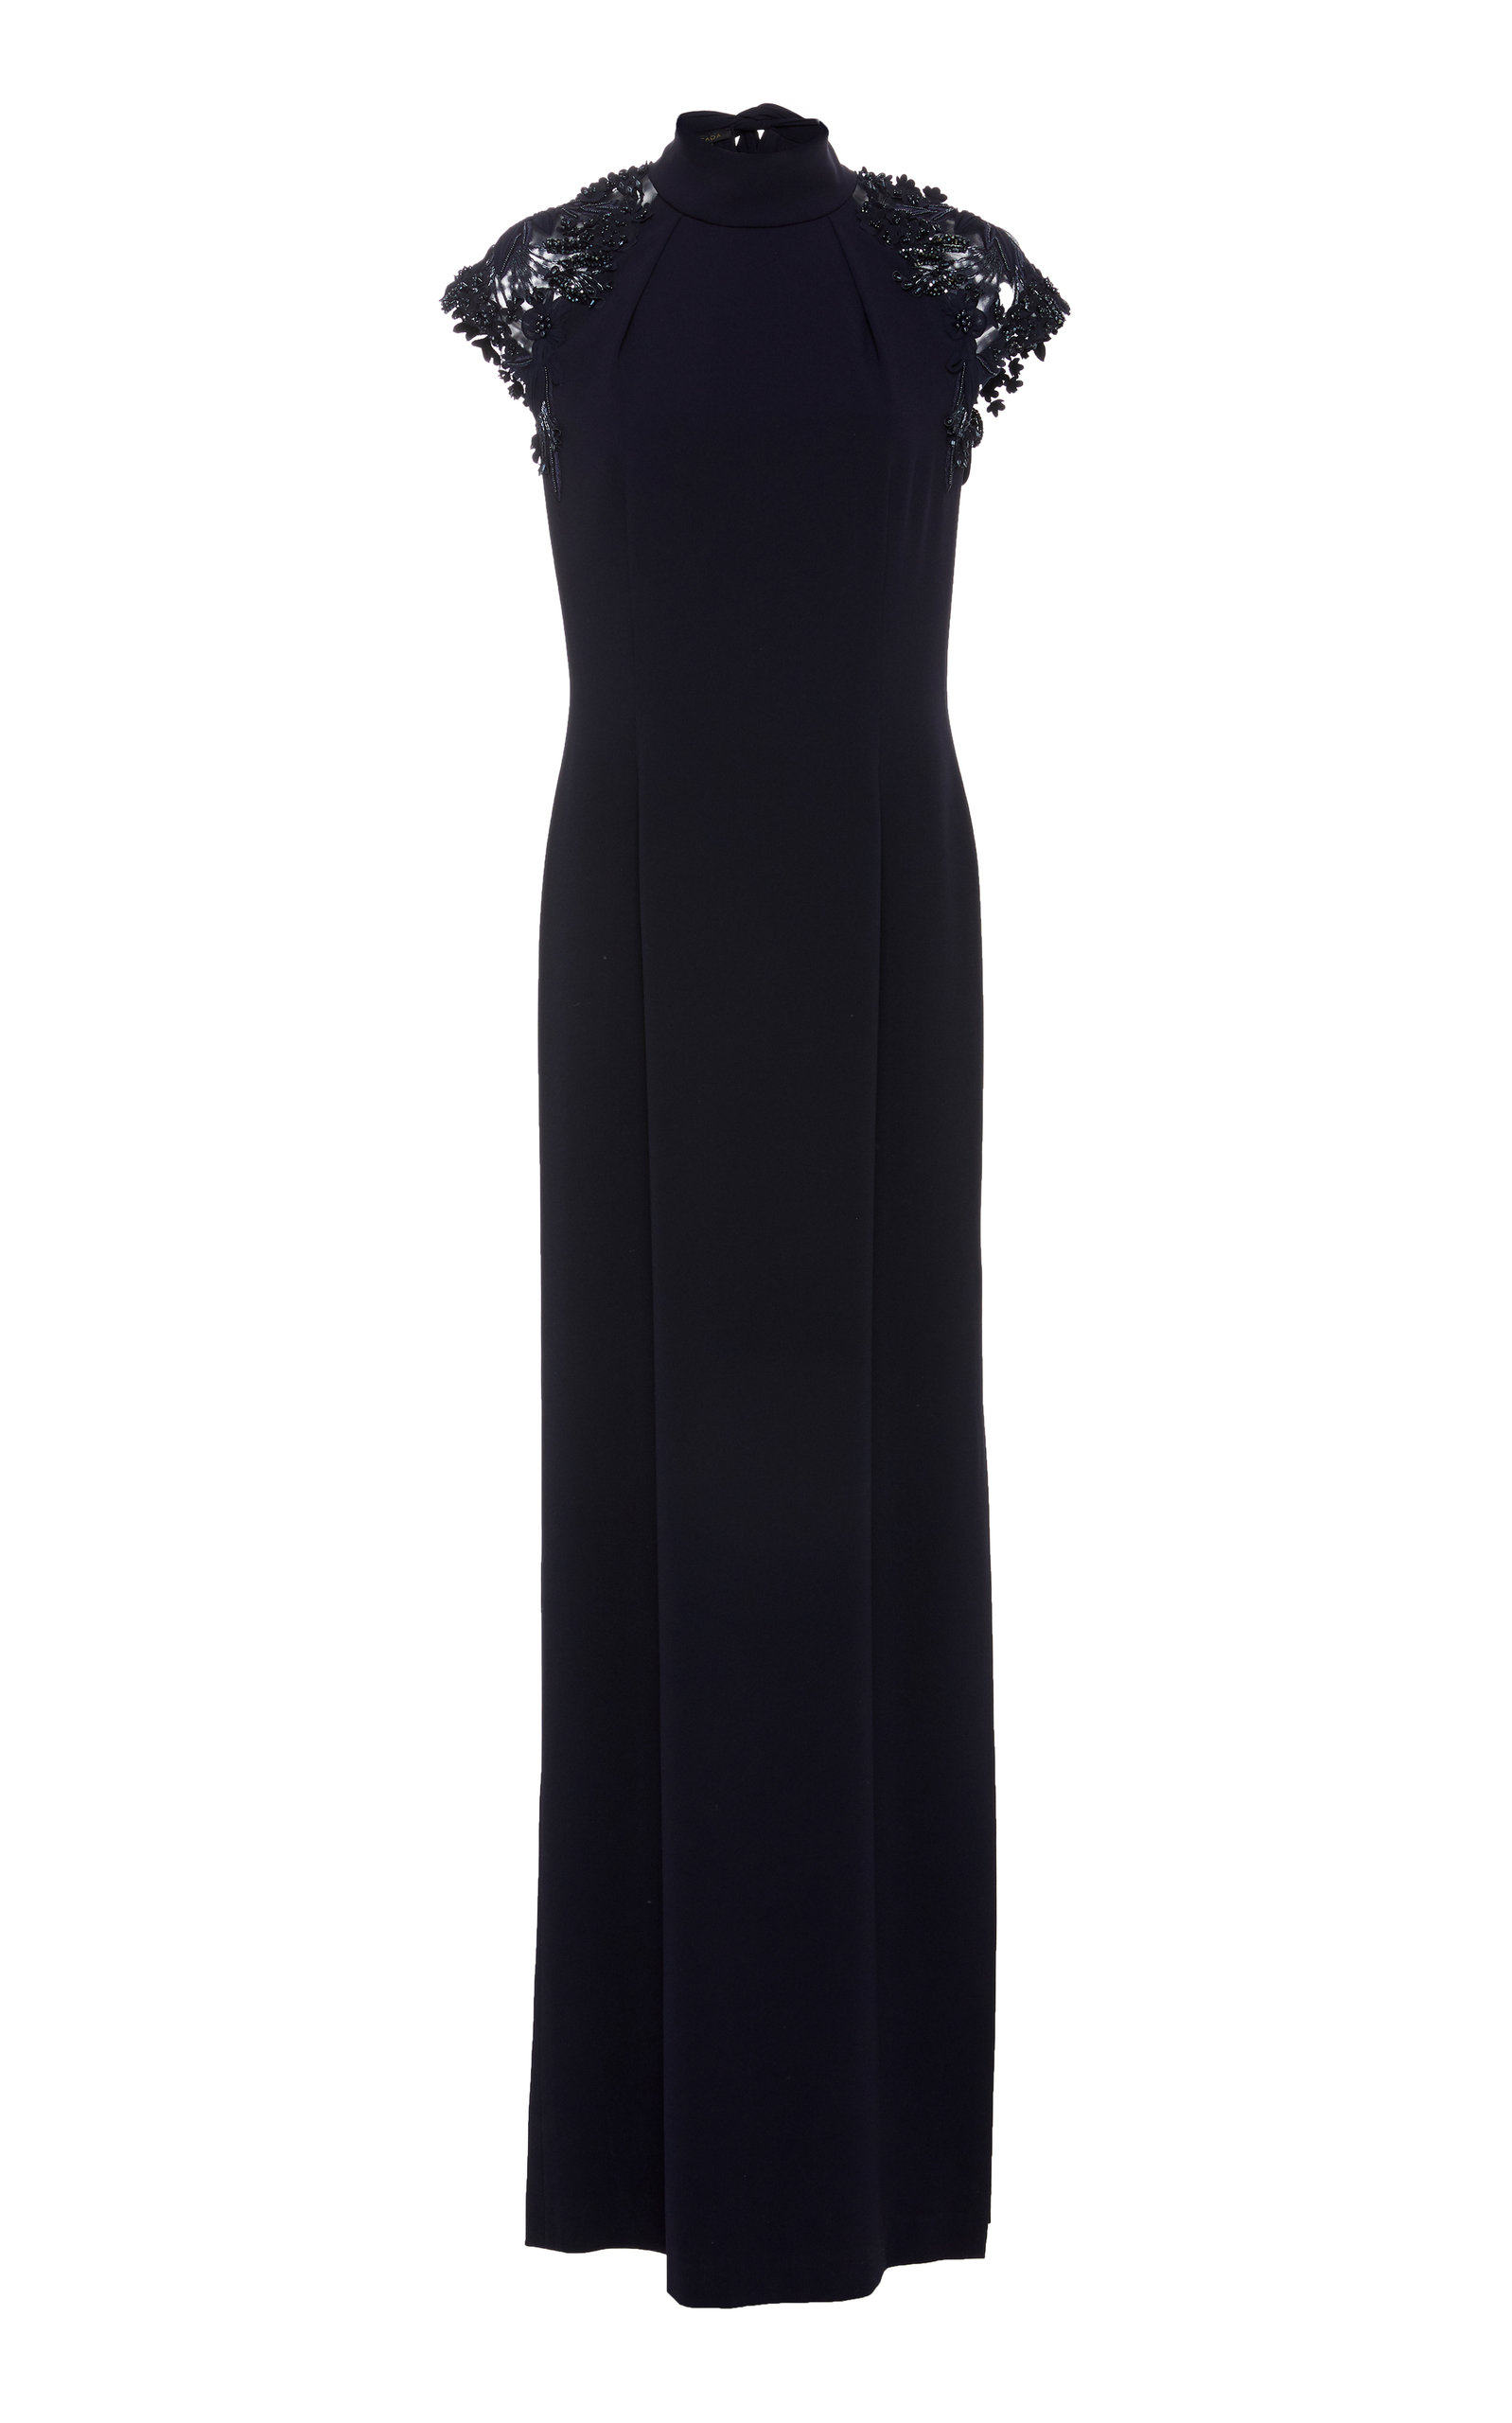 90604a5804f EscadaGeriah Lace Cap Sleeve Dress. CLOSE. Loading